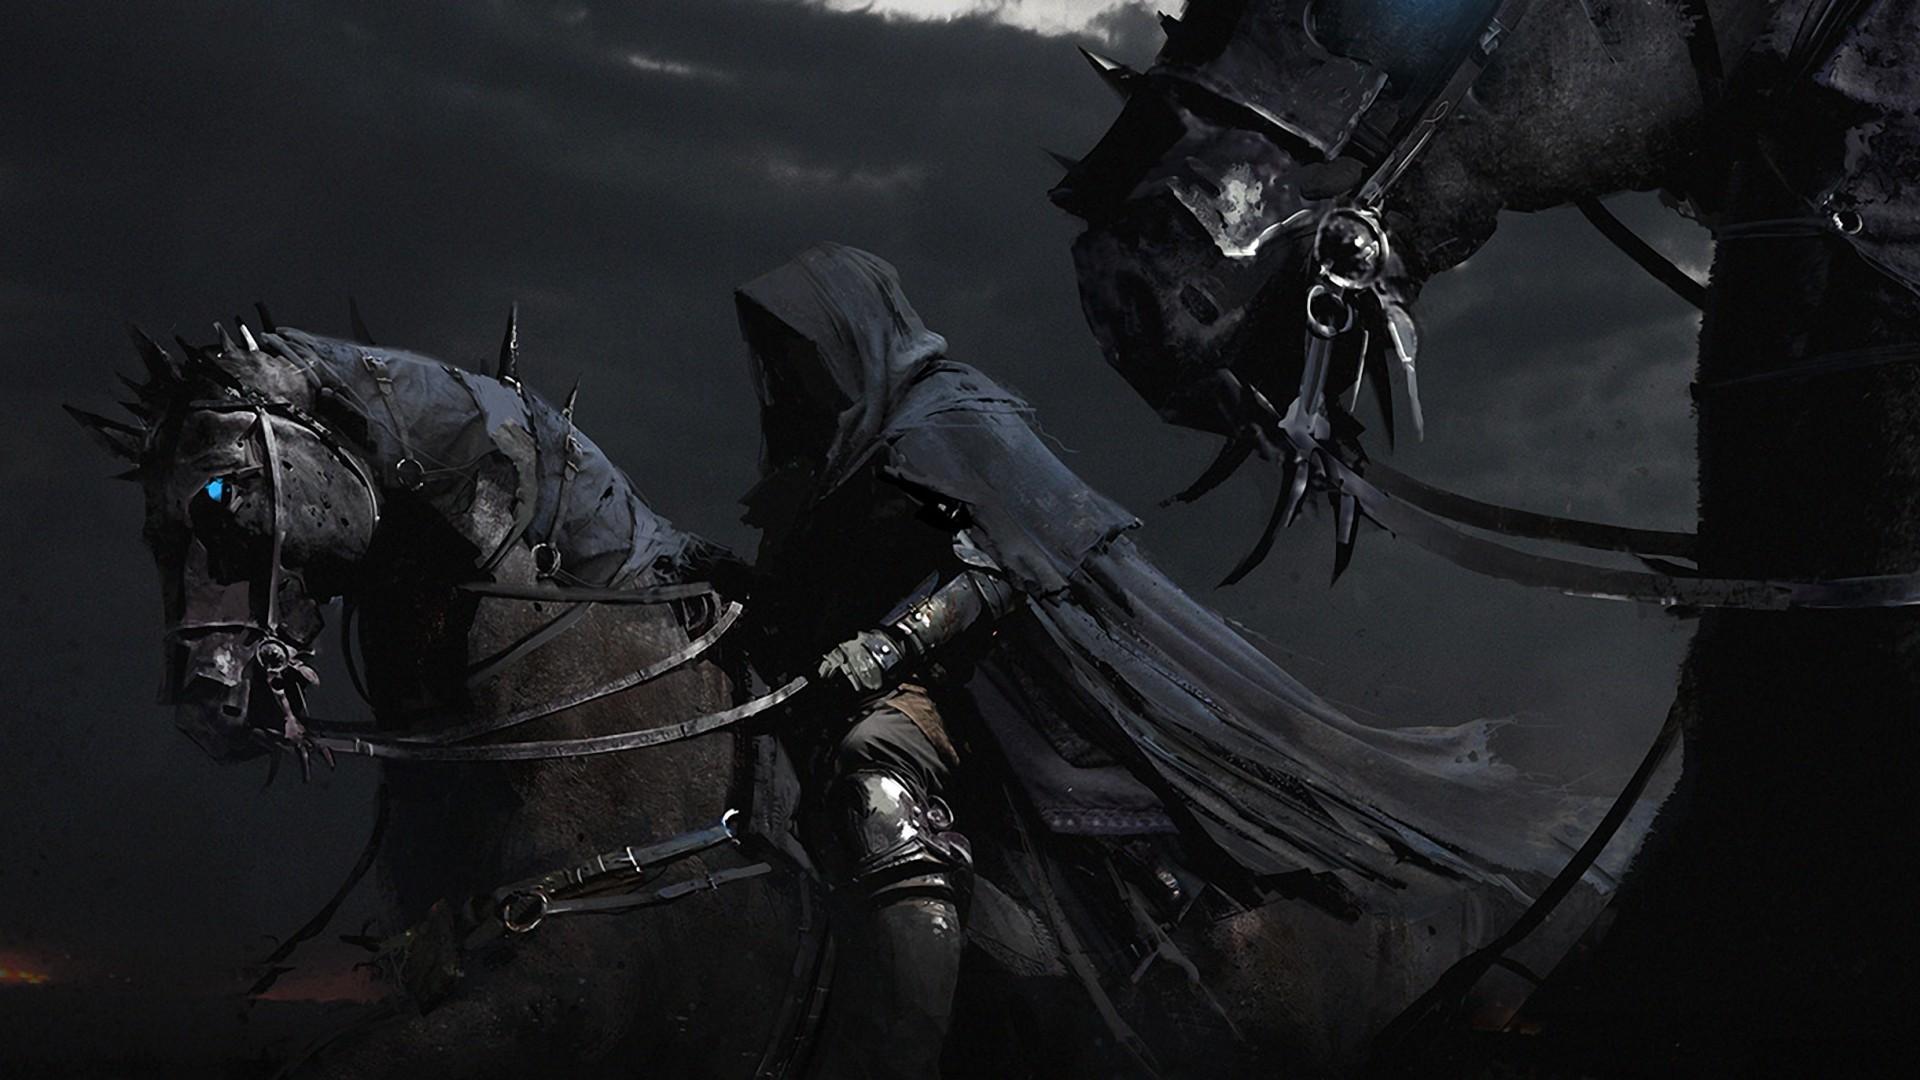 fantasy art horses nazgul ringwraith lord of the rings online wallpaper –  Animals Horses HD Desktop Wallpaper